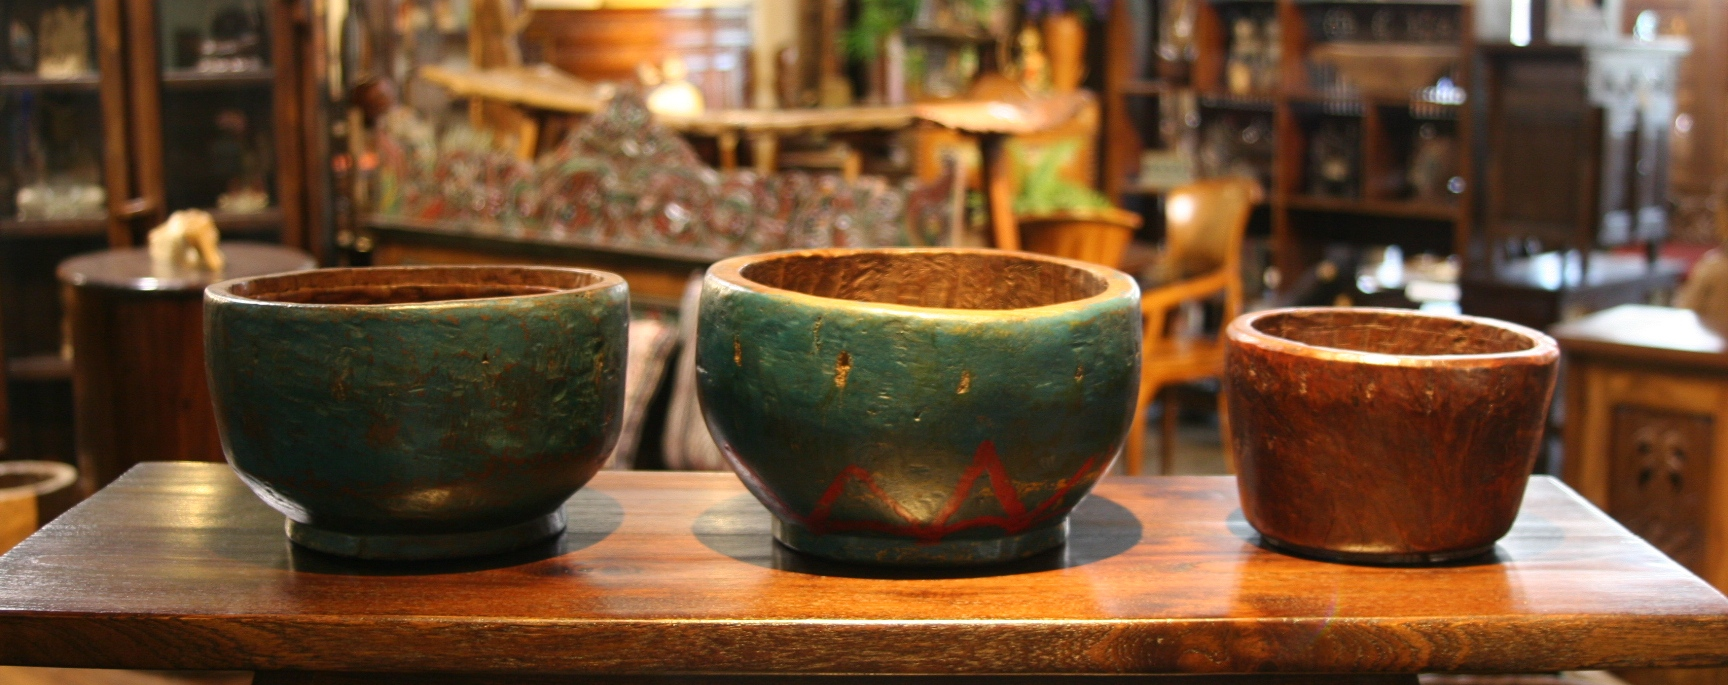 Old Rustic Bowl 2